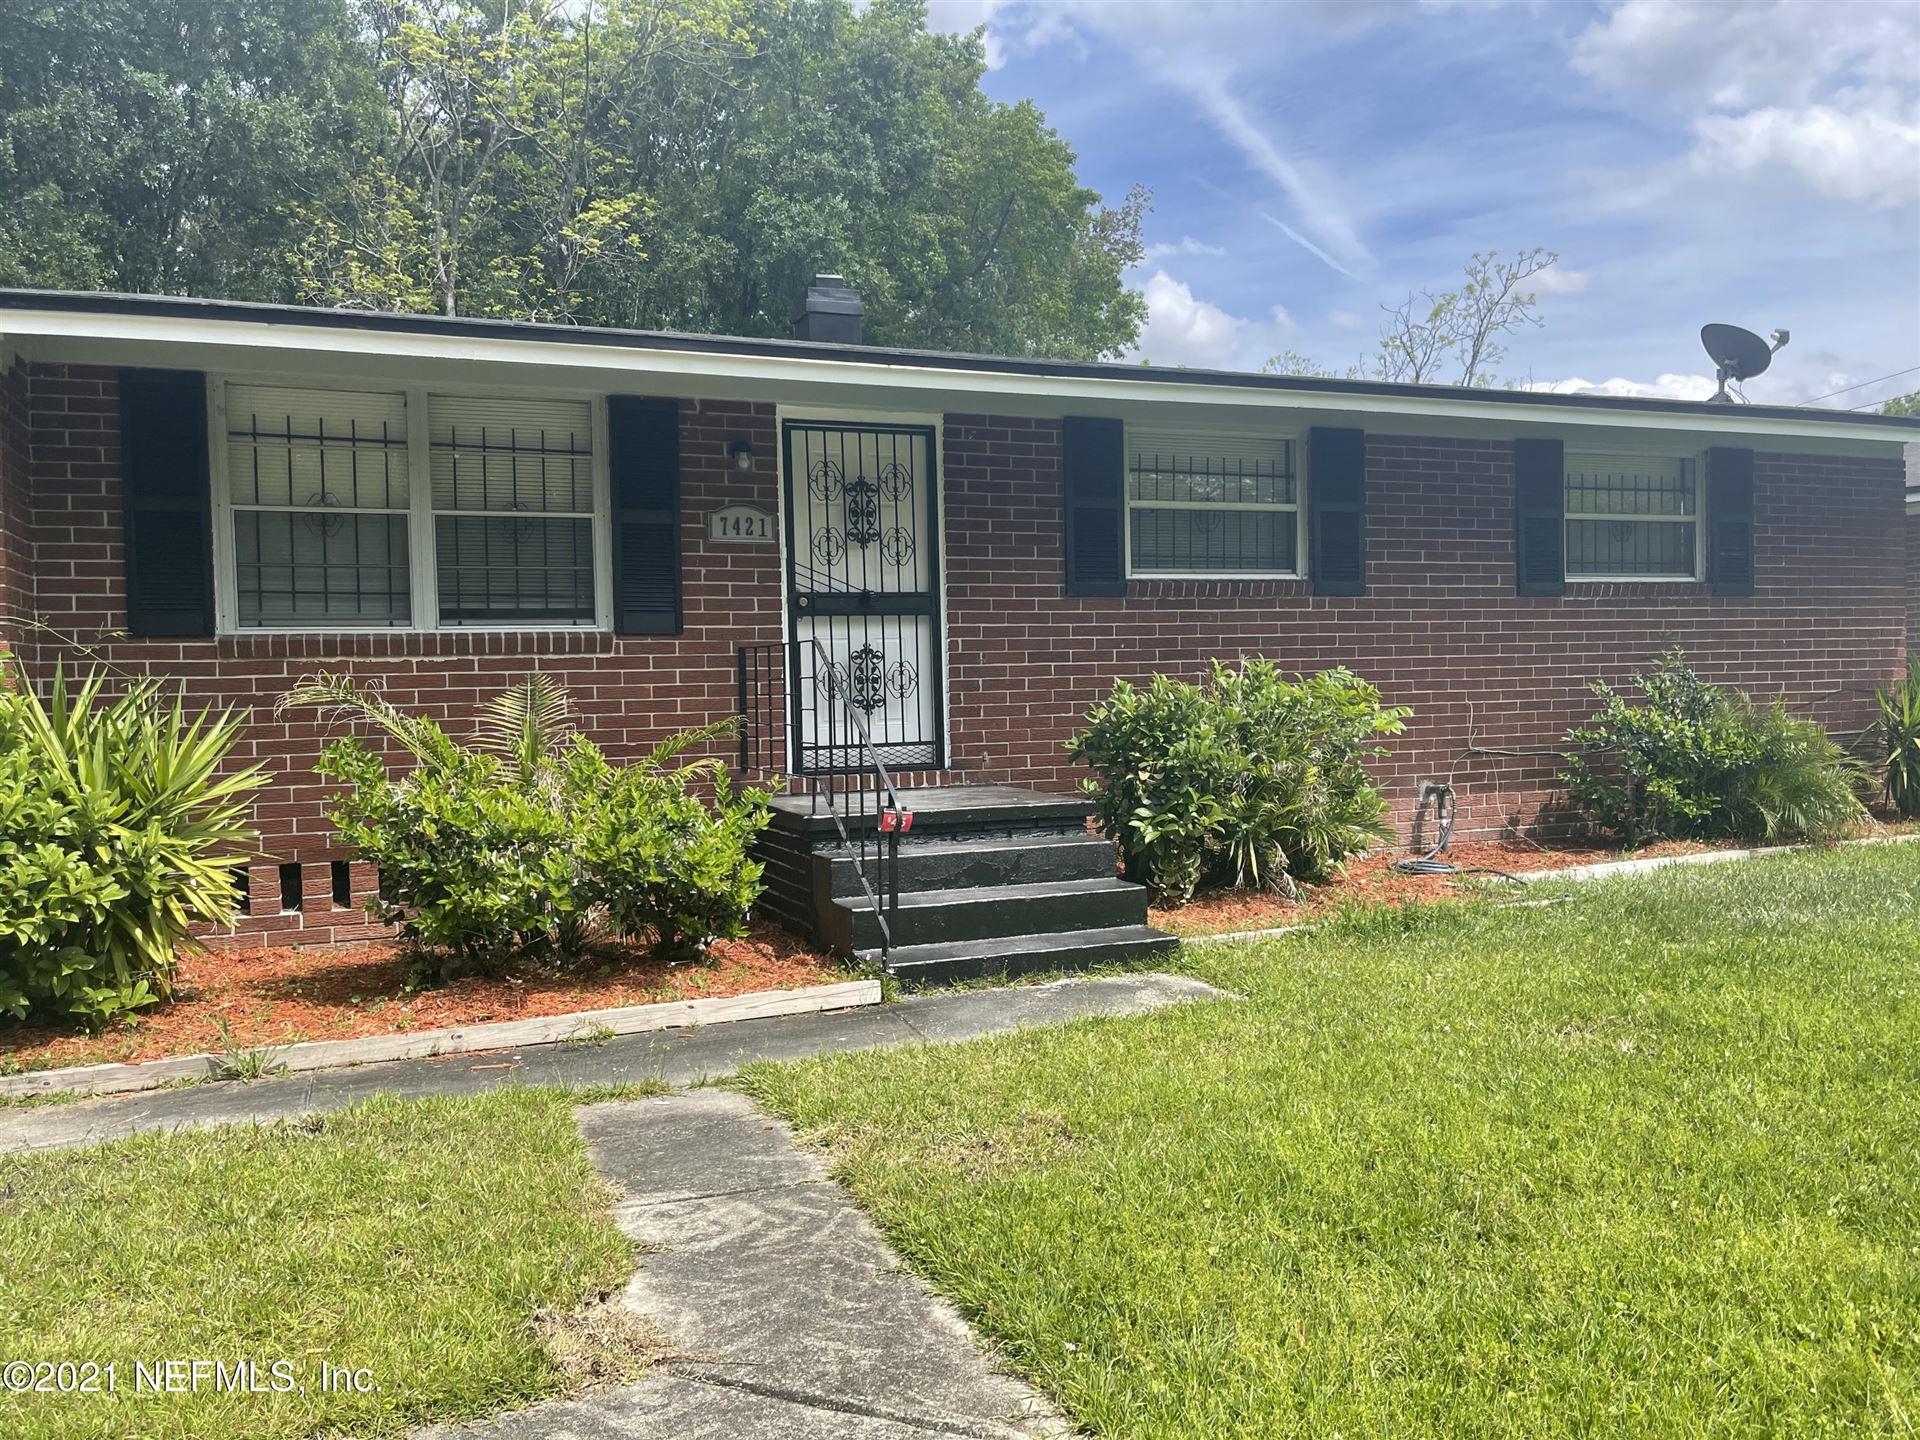 7421 RICHARDSON HEIGHTS PL #Lot No: 10, Jacksonville, FL 32209 - MLS#: 1107159